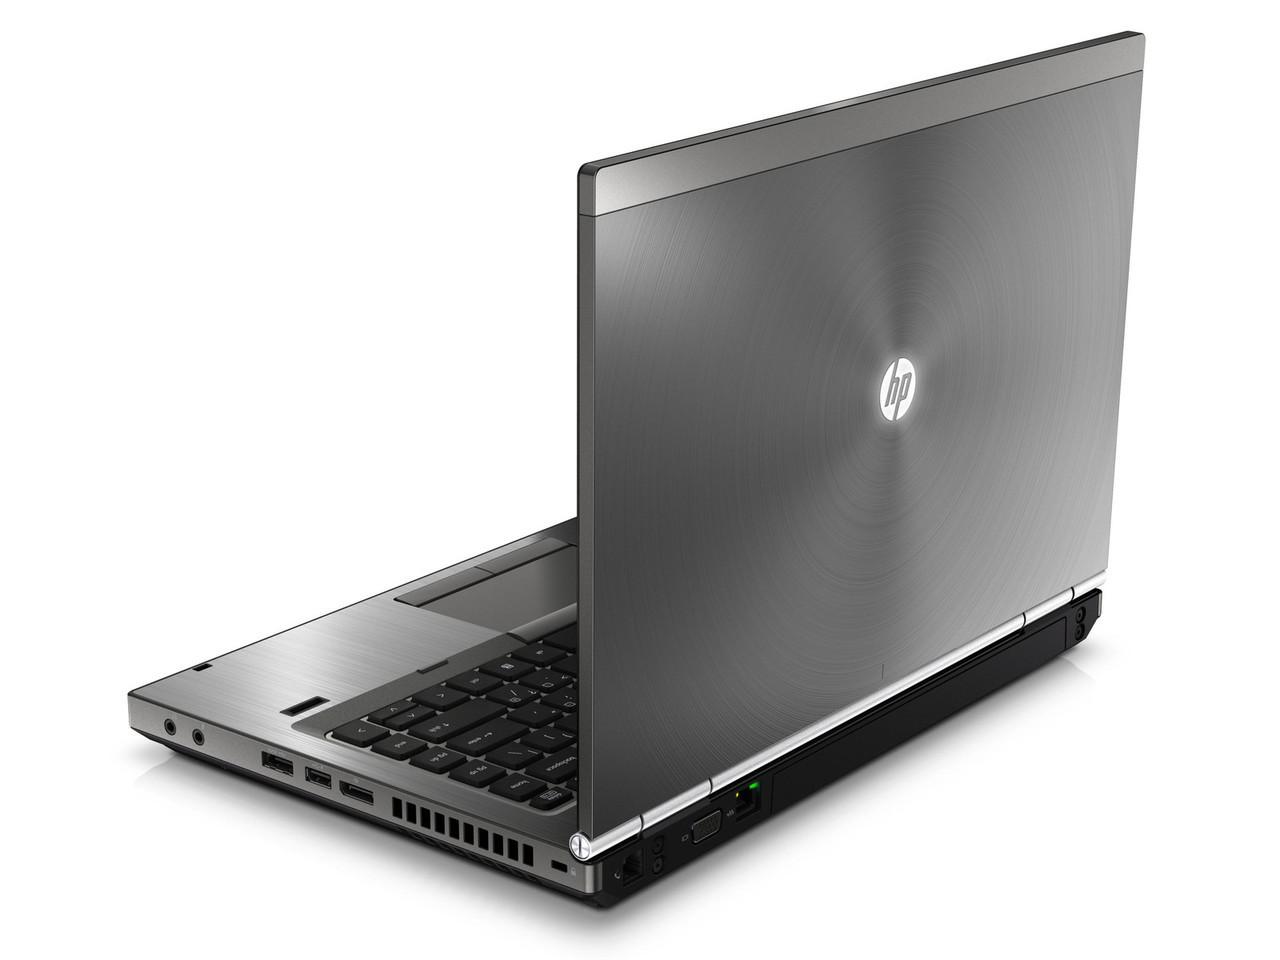 HP Compaq Elitebook 8460p Laptop Core i5 2.5GHz, 4GB Ram, 320GB HDD, DVD-RW, Windows 10 Pro 64 Notebook